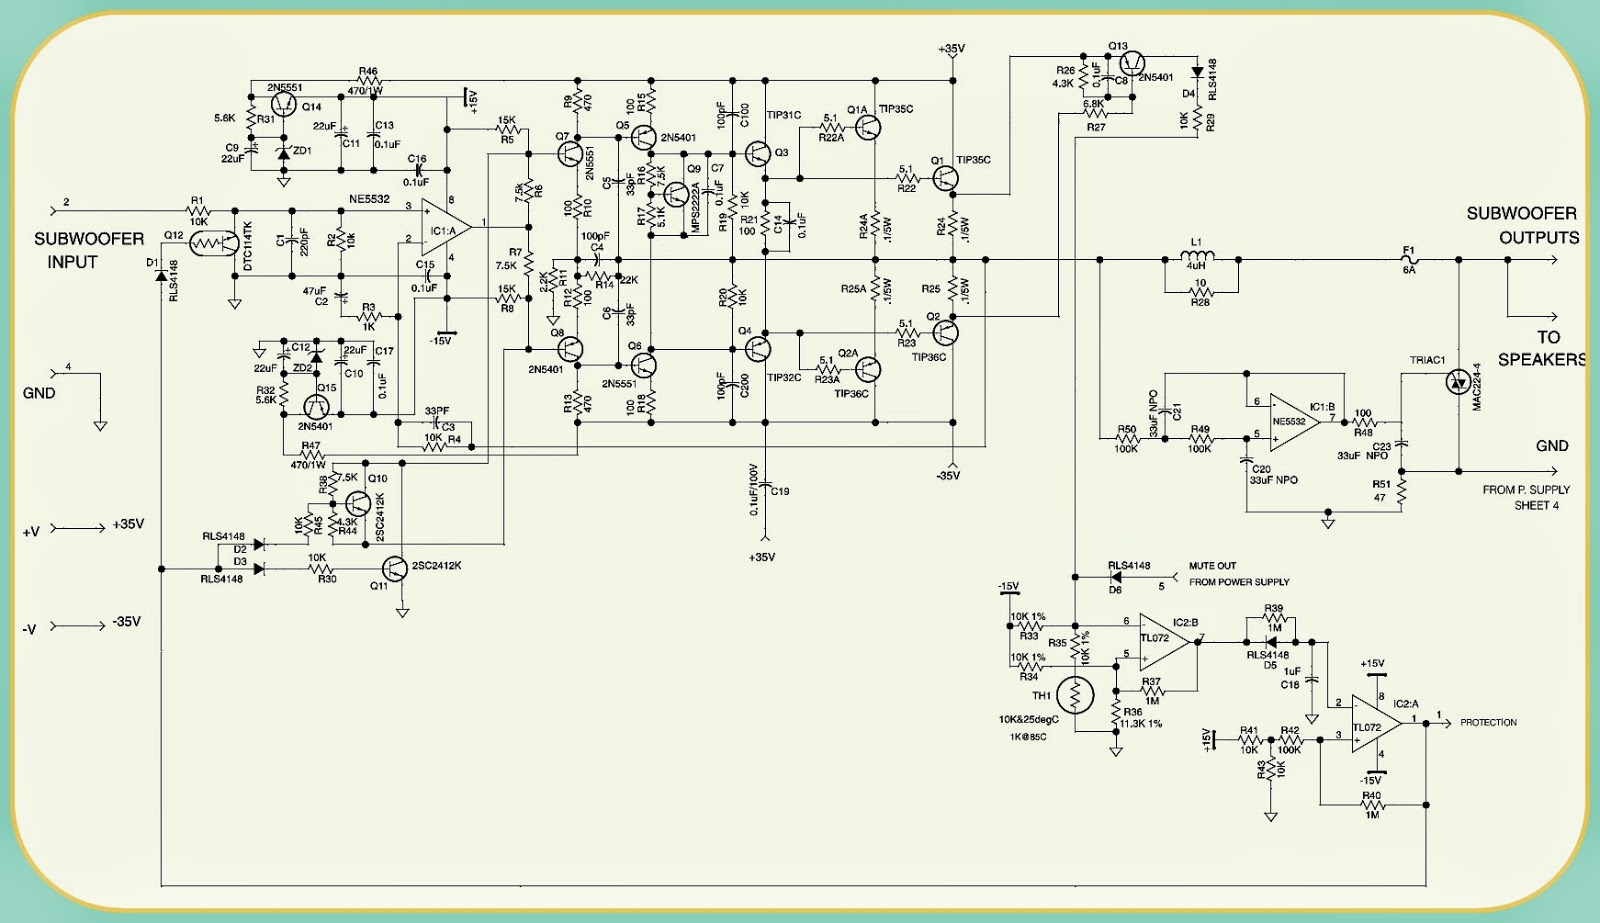 hight resolution of bass 550 jbl powered subwoofer schematic circuit diagram jbl powered subwoofer bass550 circuit diagram exploded view power